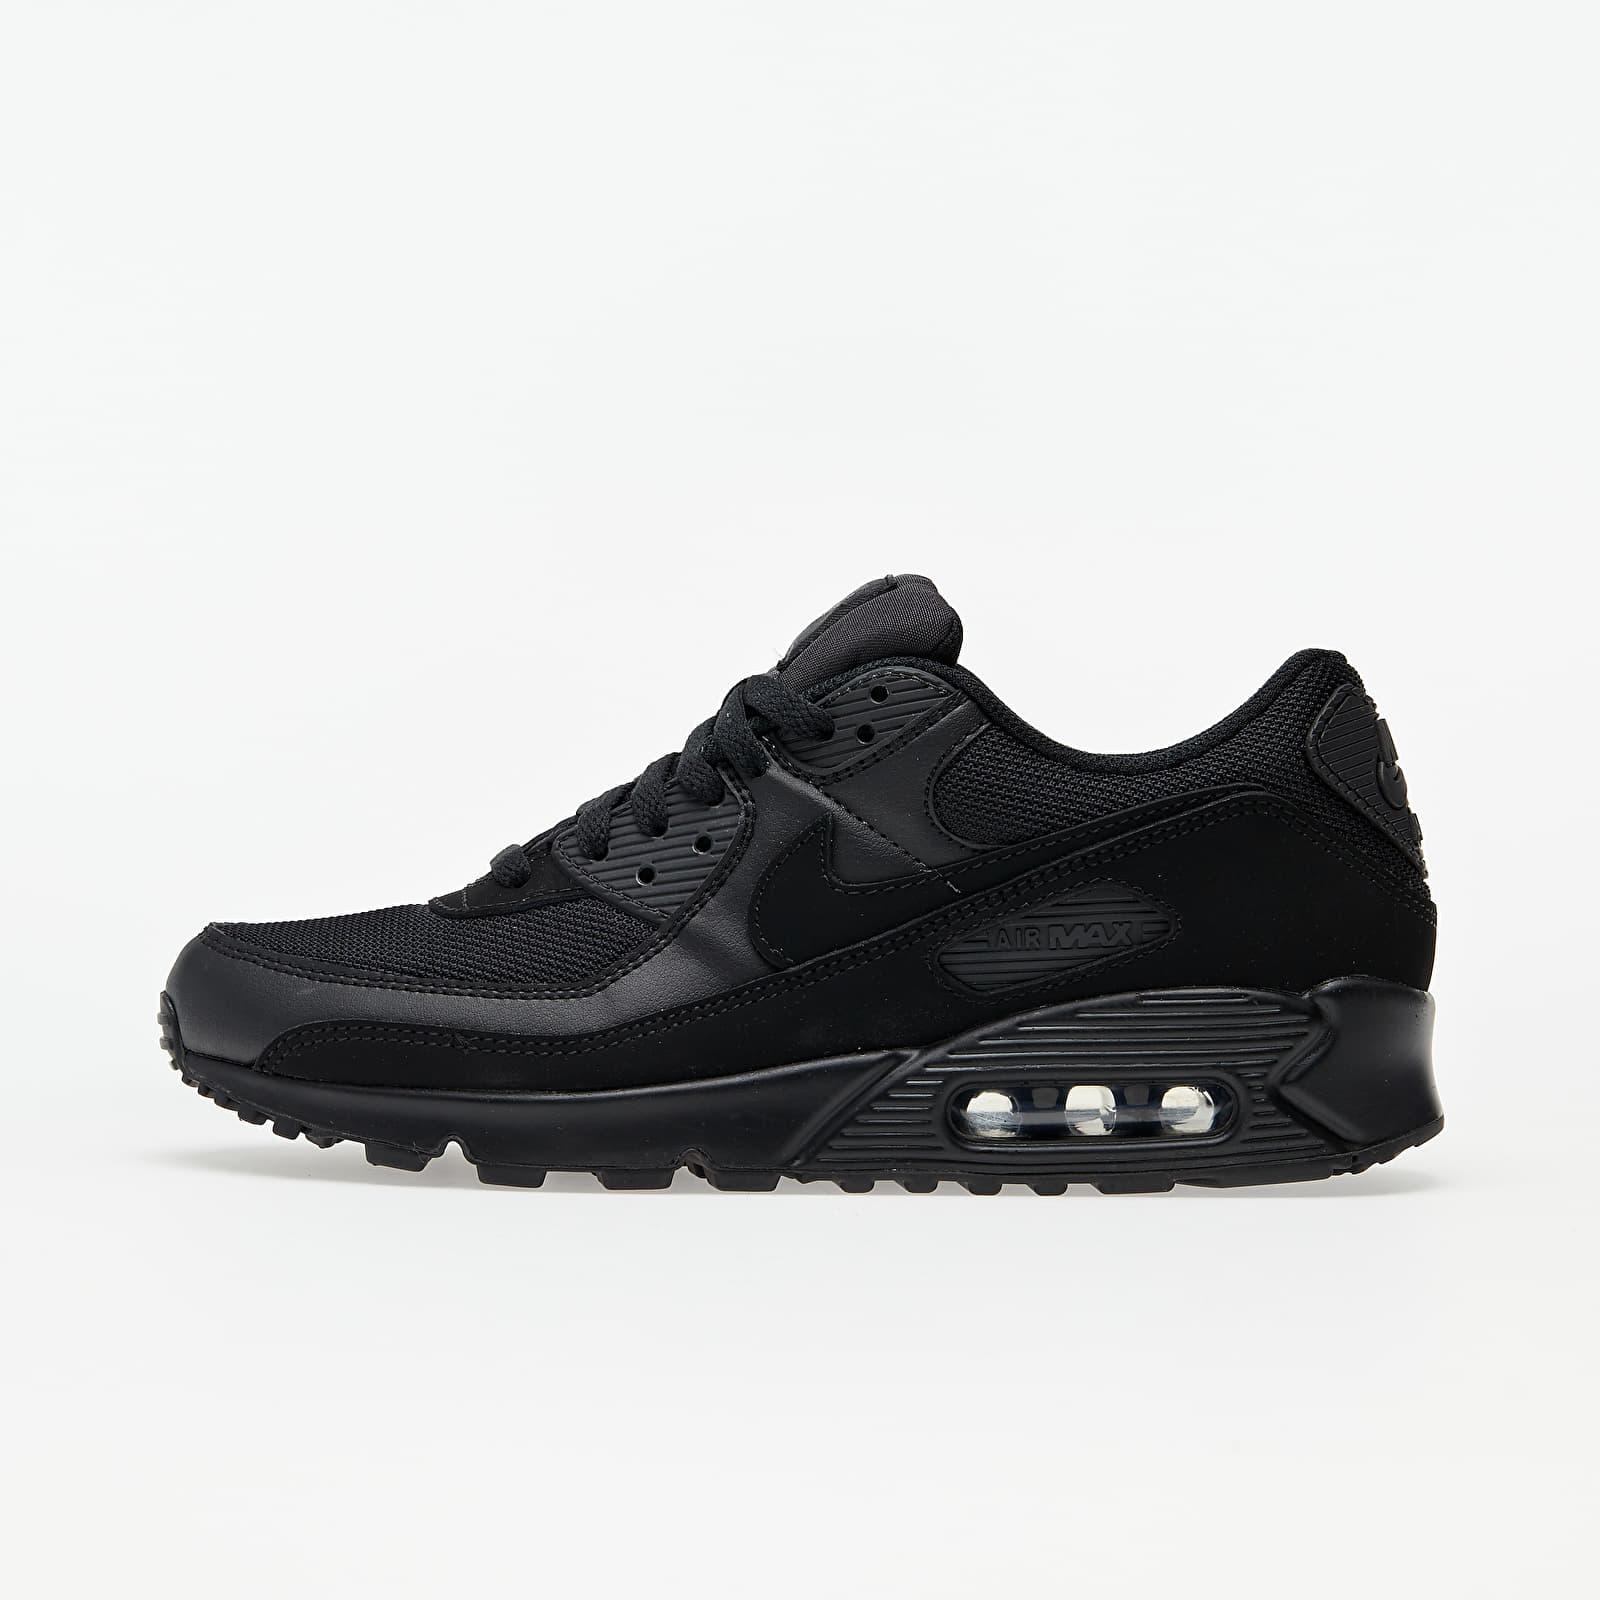 Nike Air Max 90 Black/ Black-Black-White CN8490-003